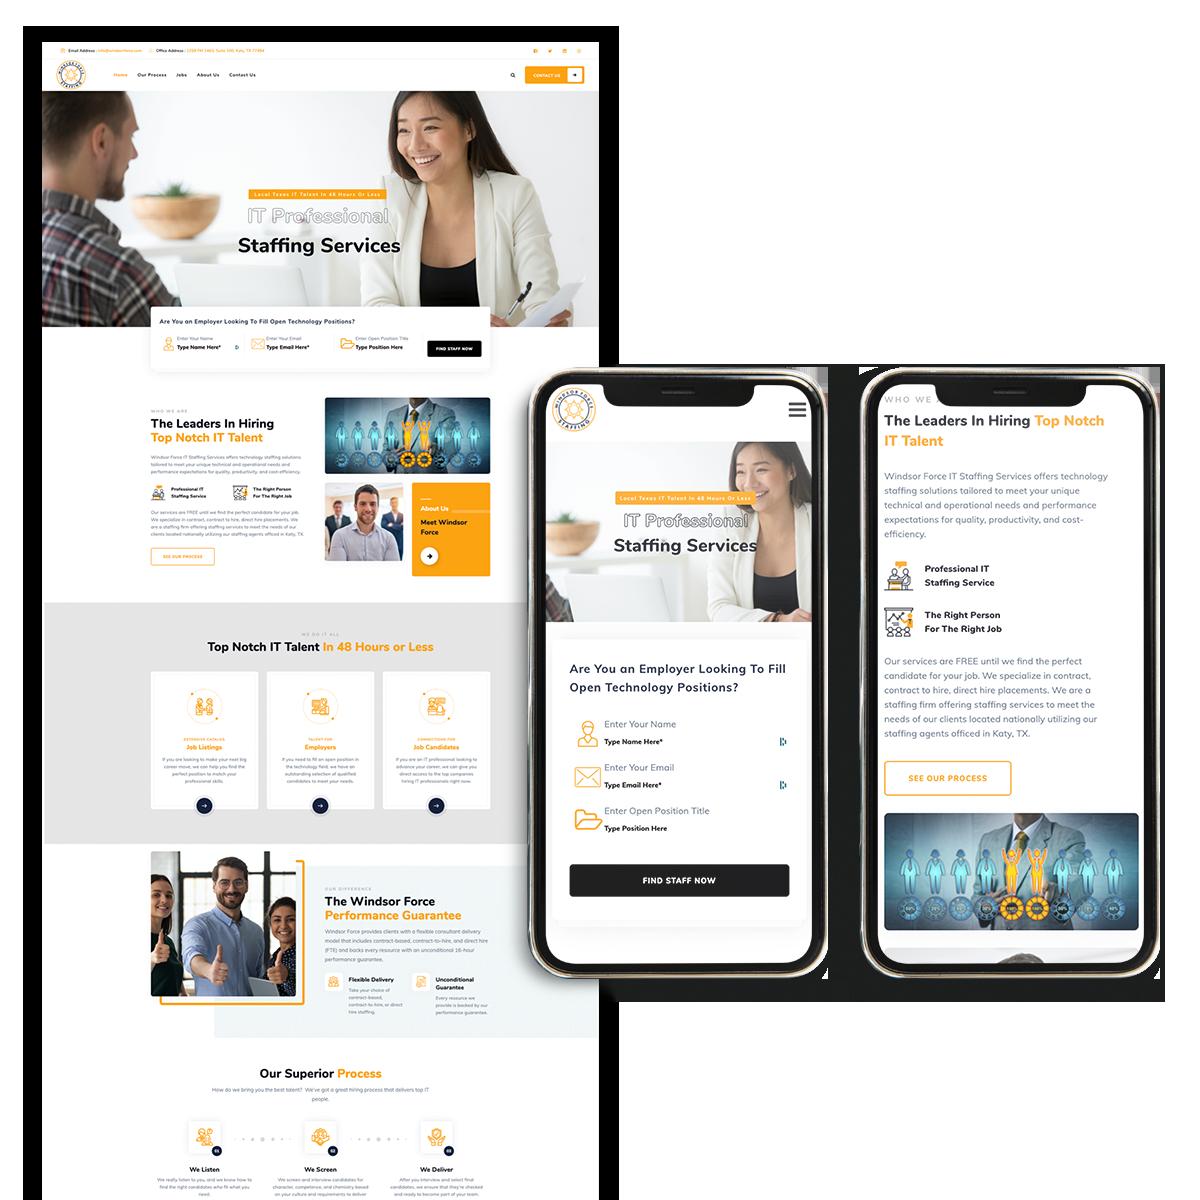 6-Create-Portfolio-Images-Desktop-Mobile-Websites